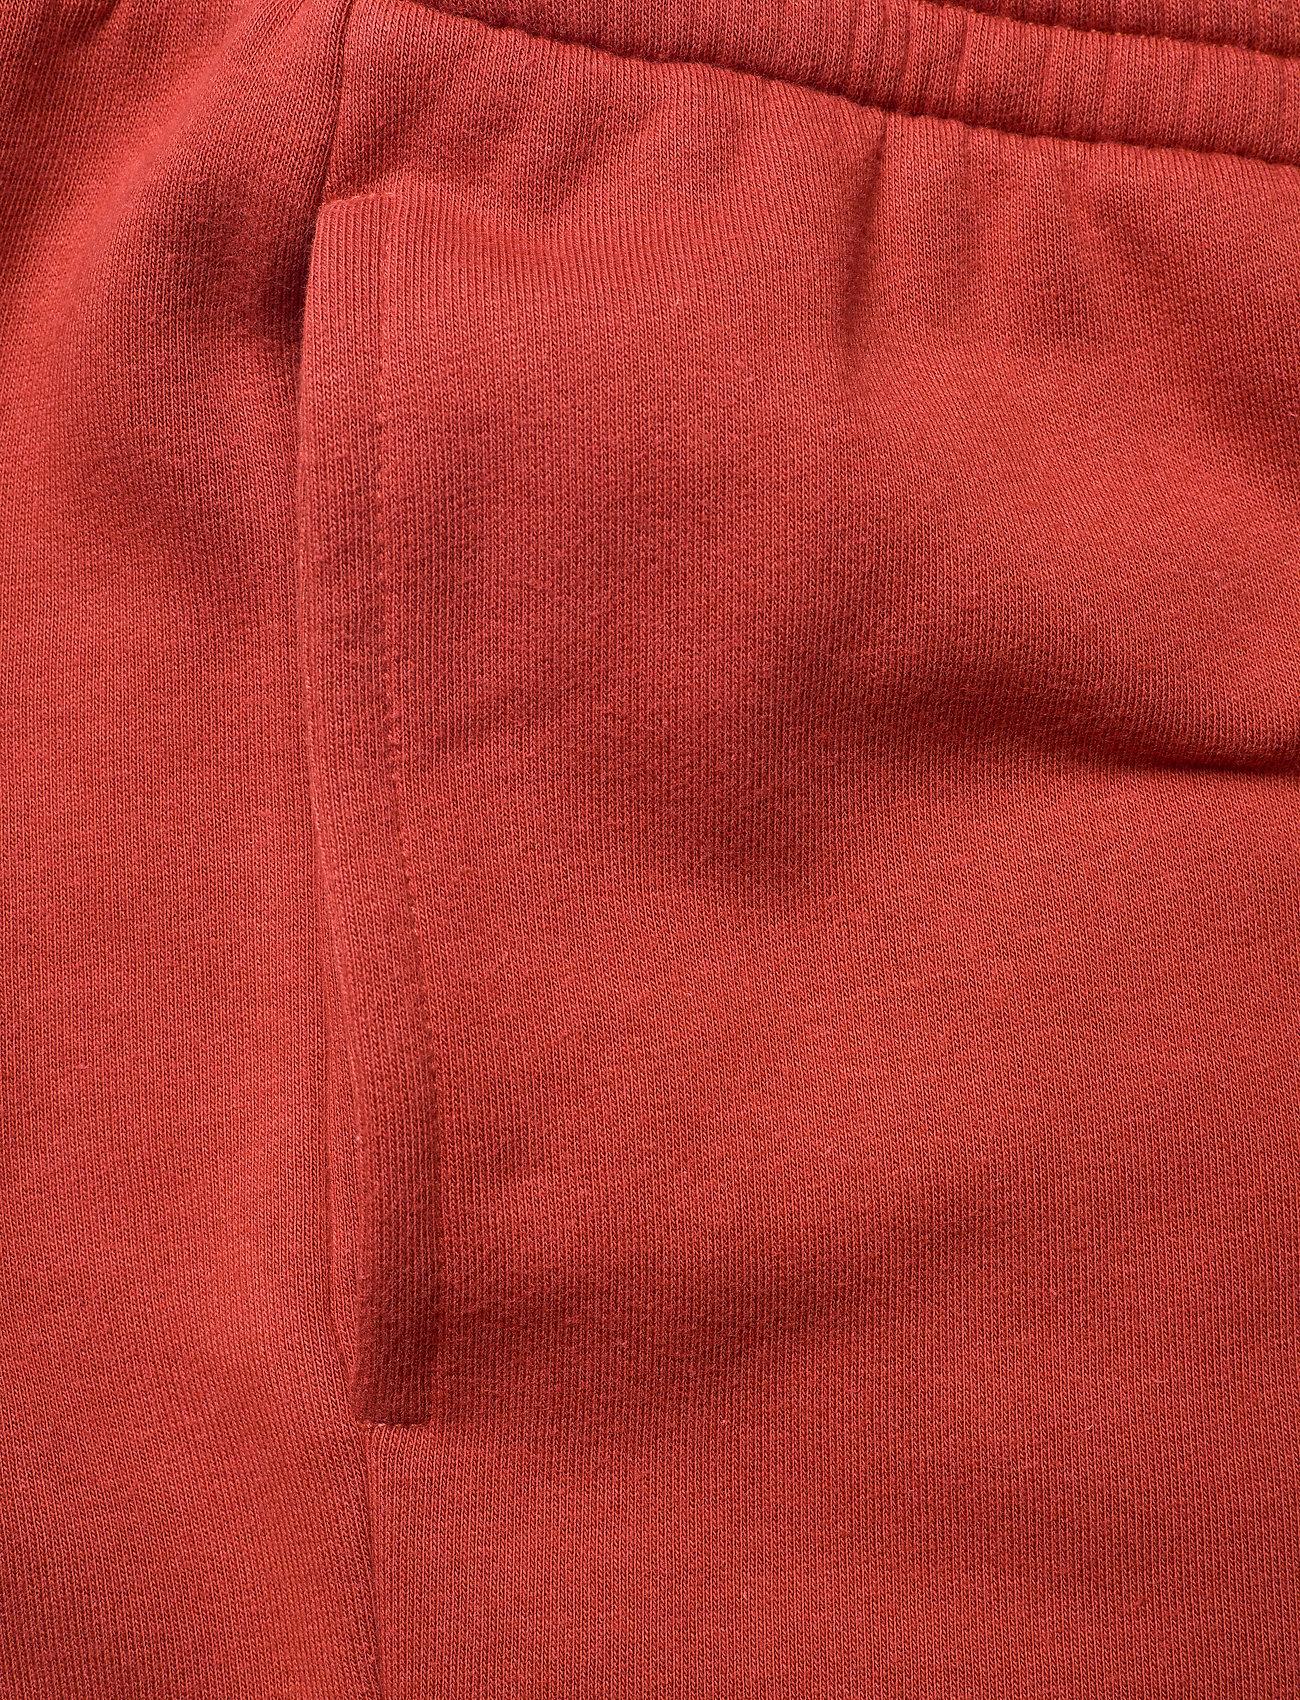 2NDDAY - 2ND Play ThinkTwice - tøj - red ochre - 5